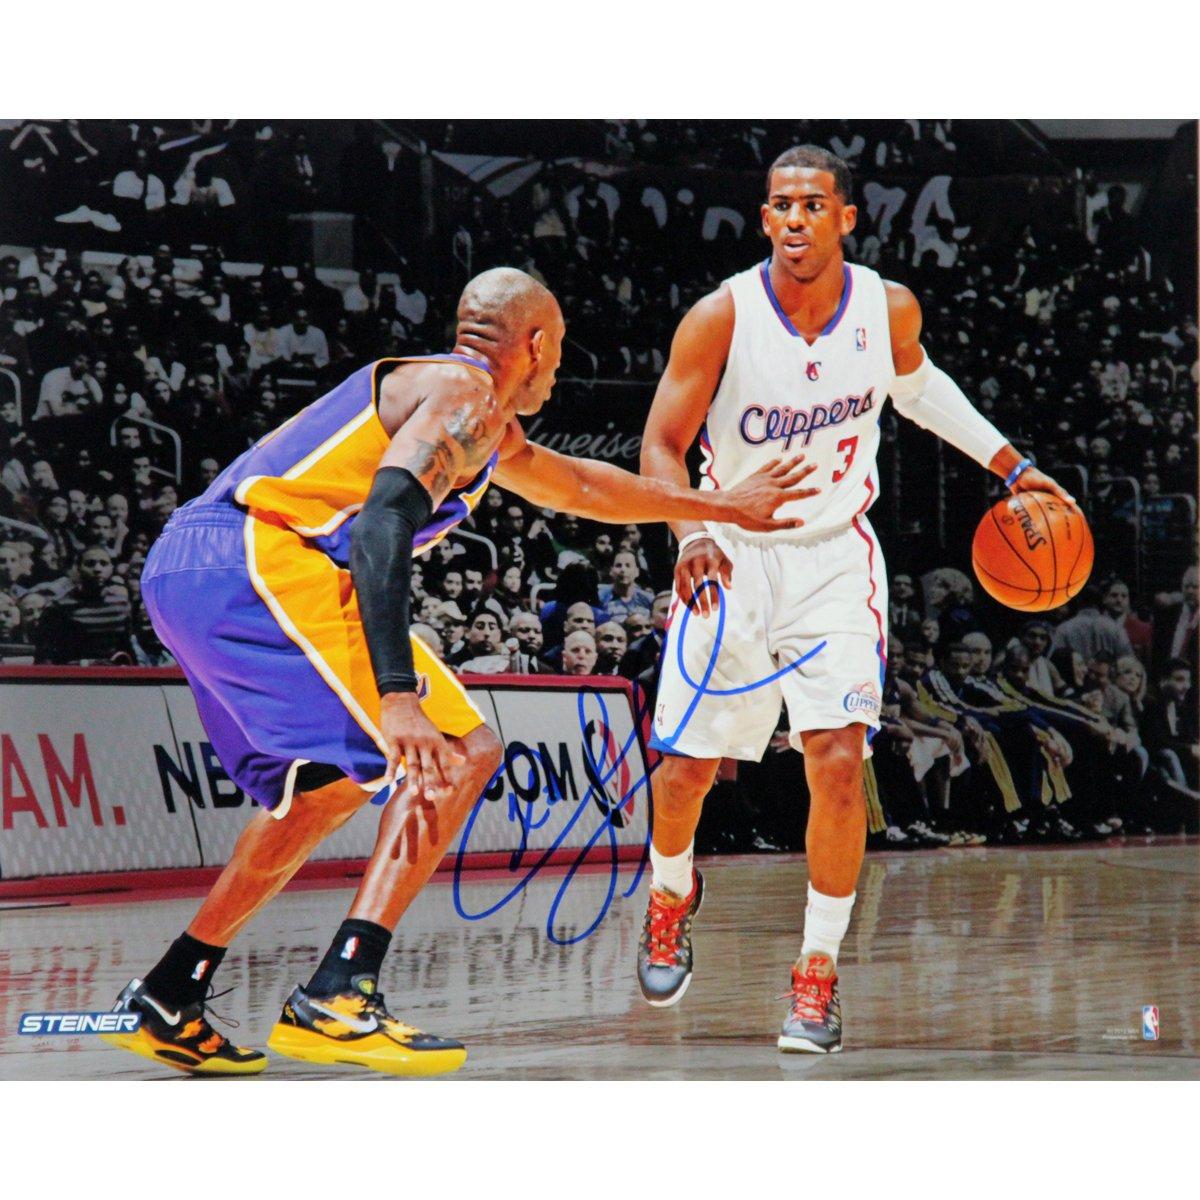 Steiner Sports NBA Los Angeles Clippers Chris Paul vs. Kobe Bryant Unterzeichnet Foto, 16x 20-feet